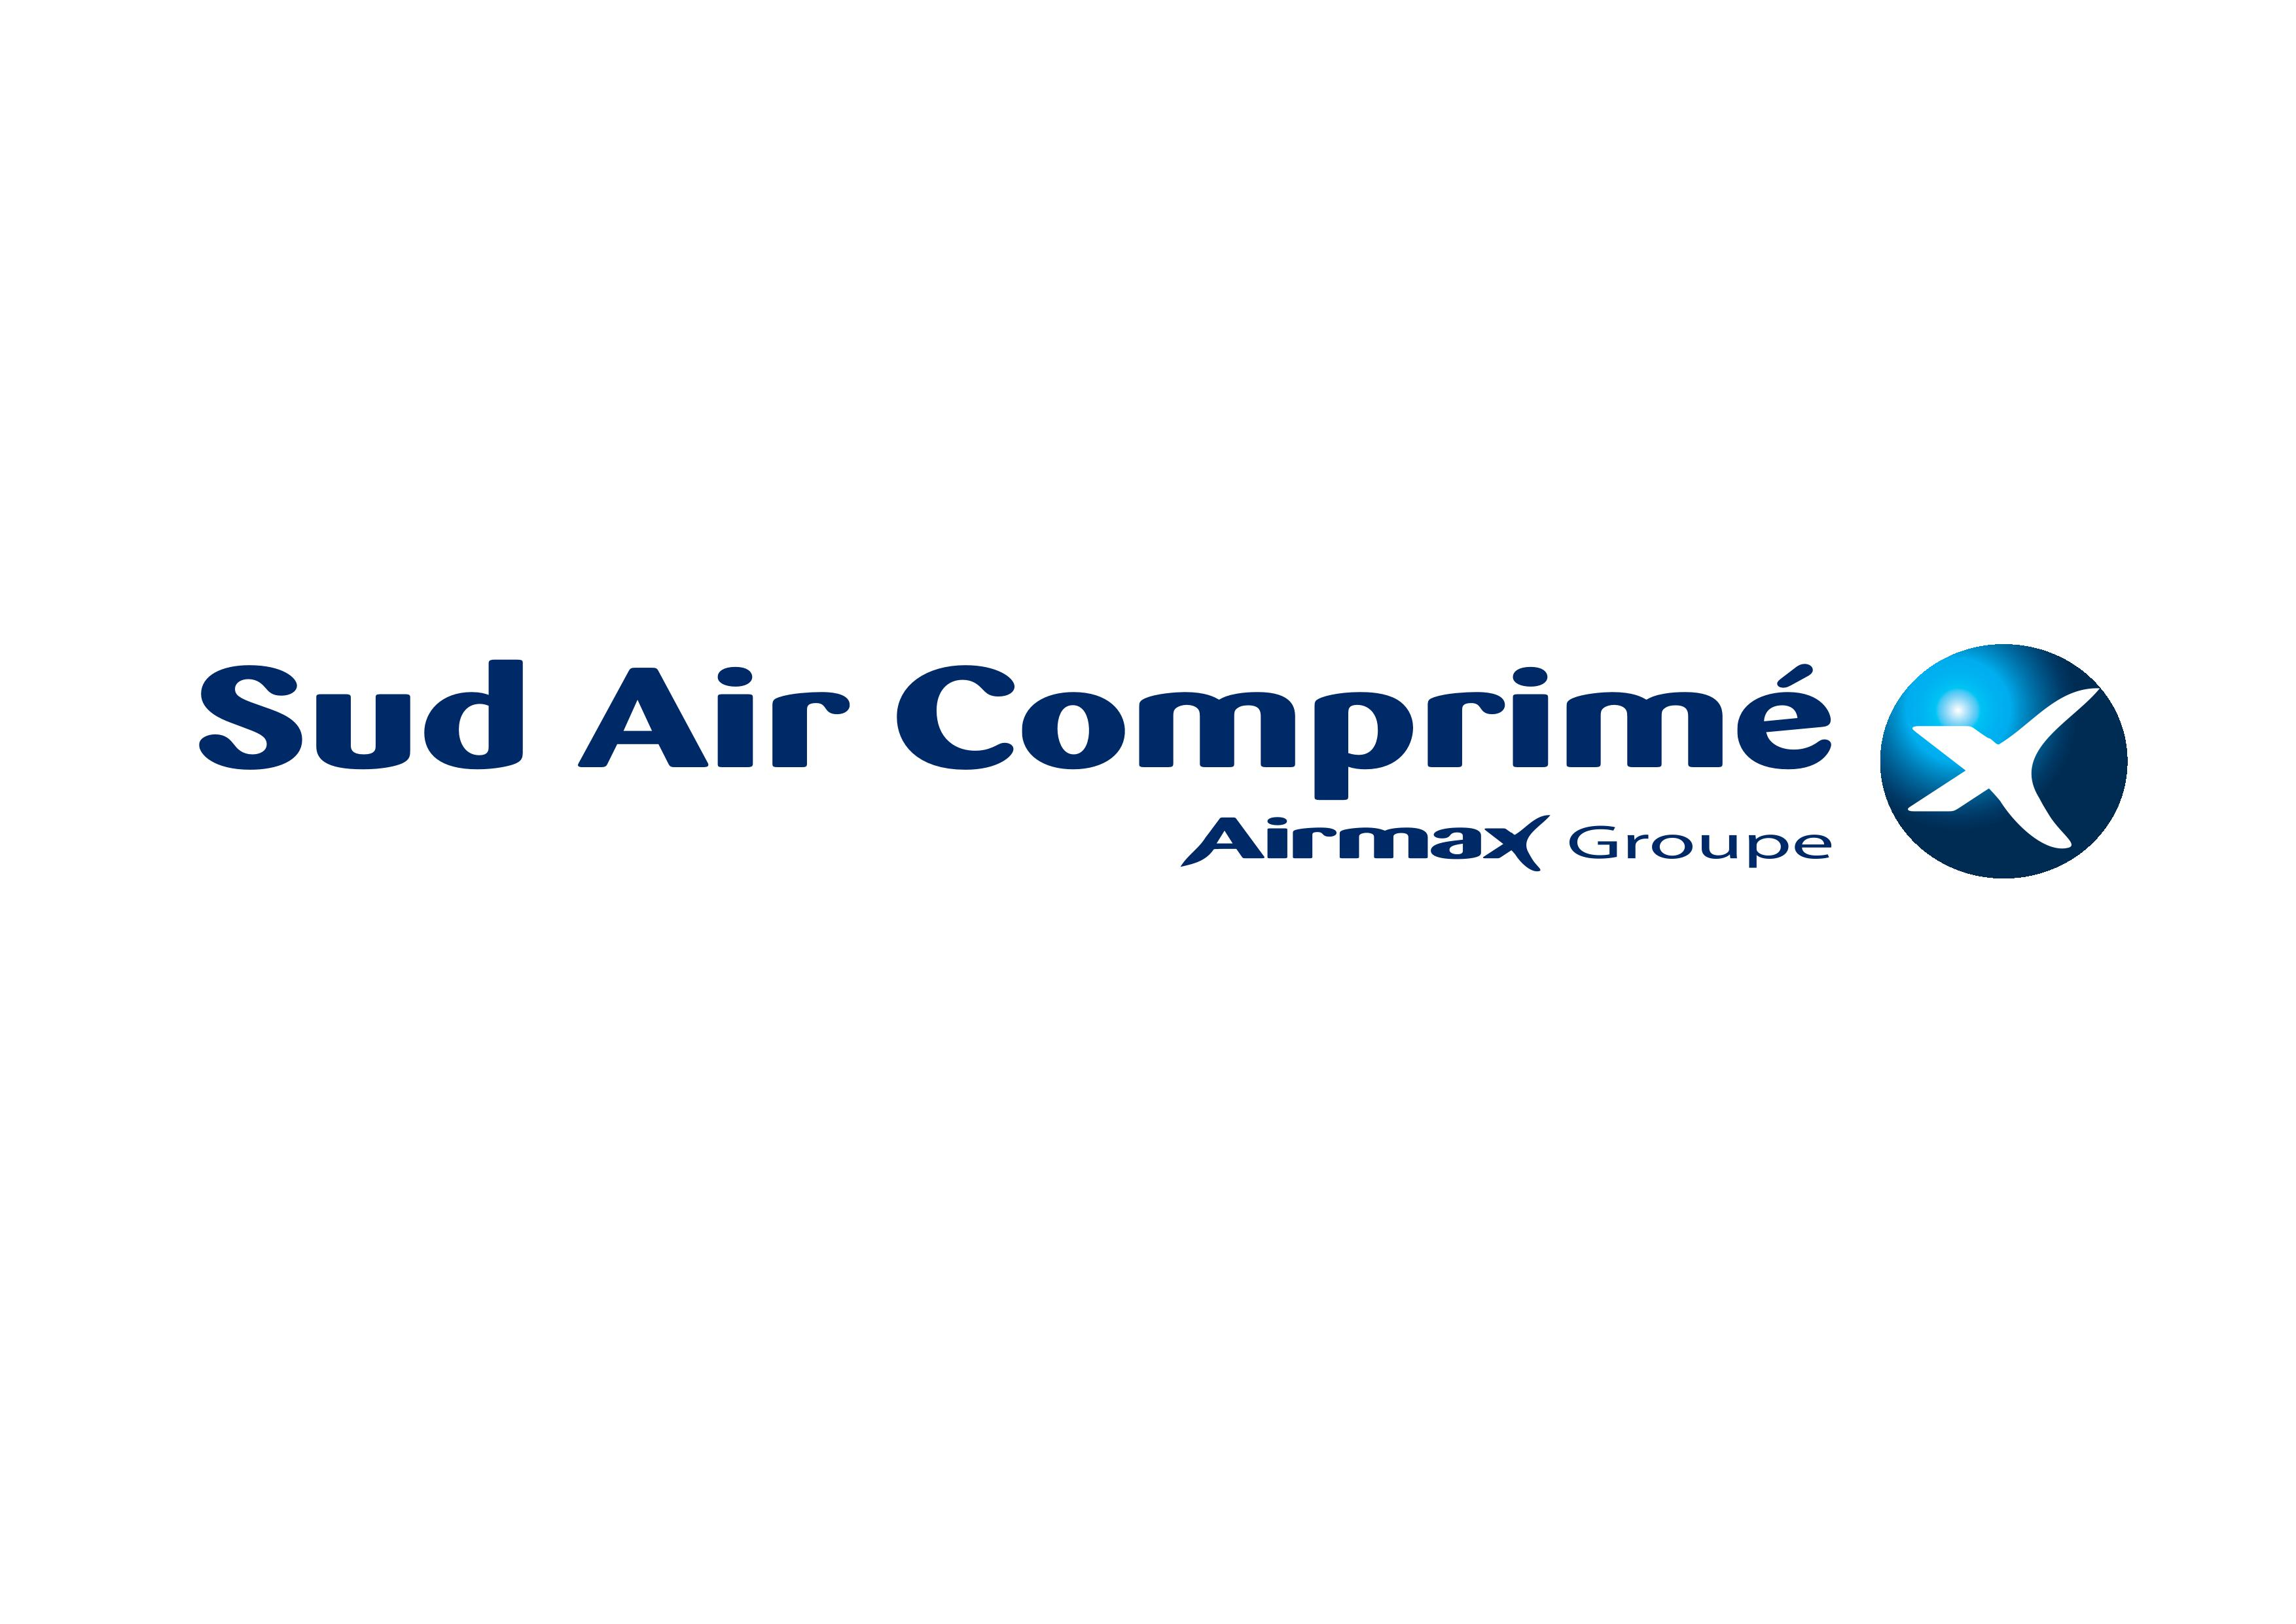 1533117710-sud-air-comprime.jpg